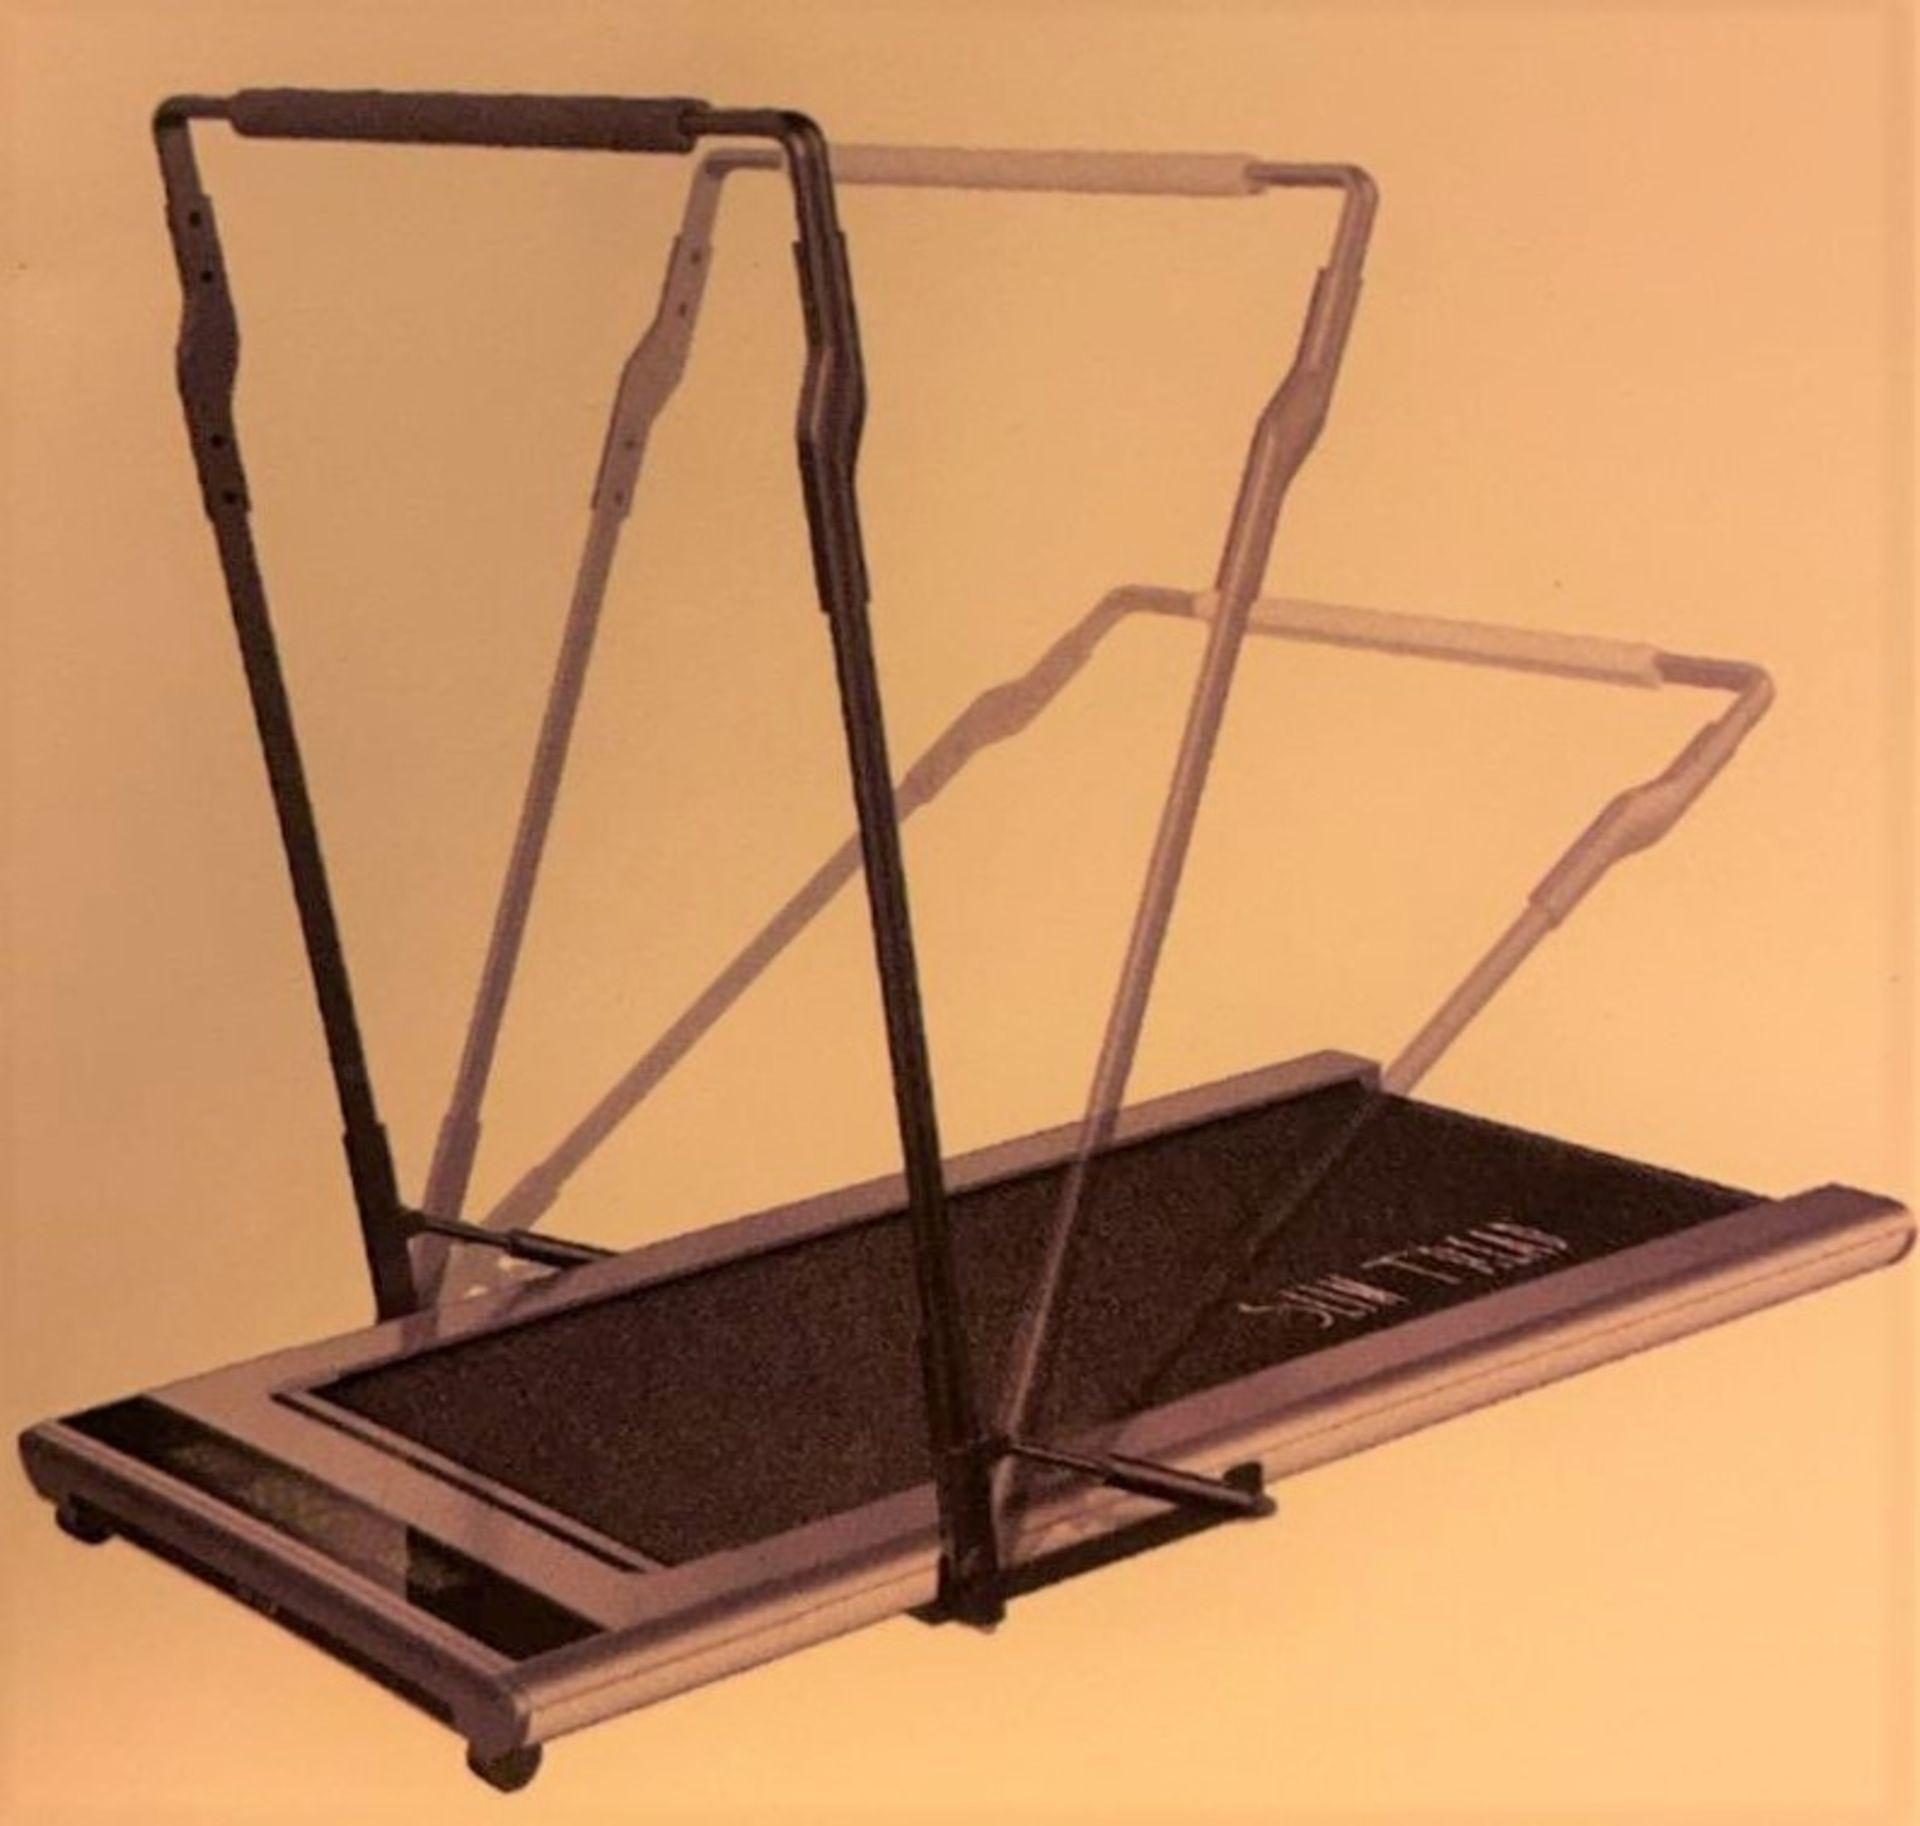 1 x Slim Tread Ultra Thin Smart Treadmill Running / Walking Machine - Lightweight With Folding - Image 16 of 23